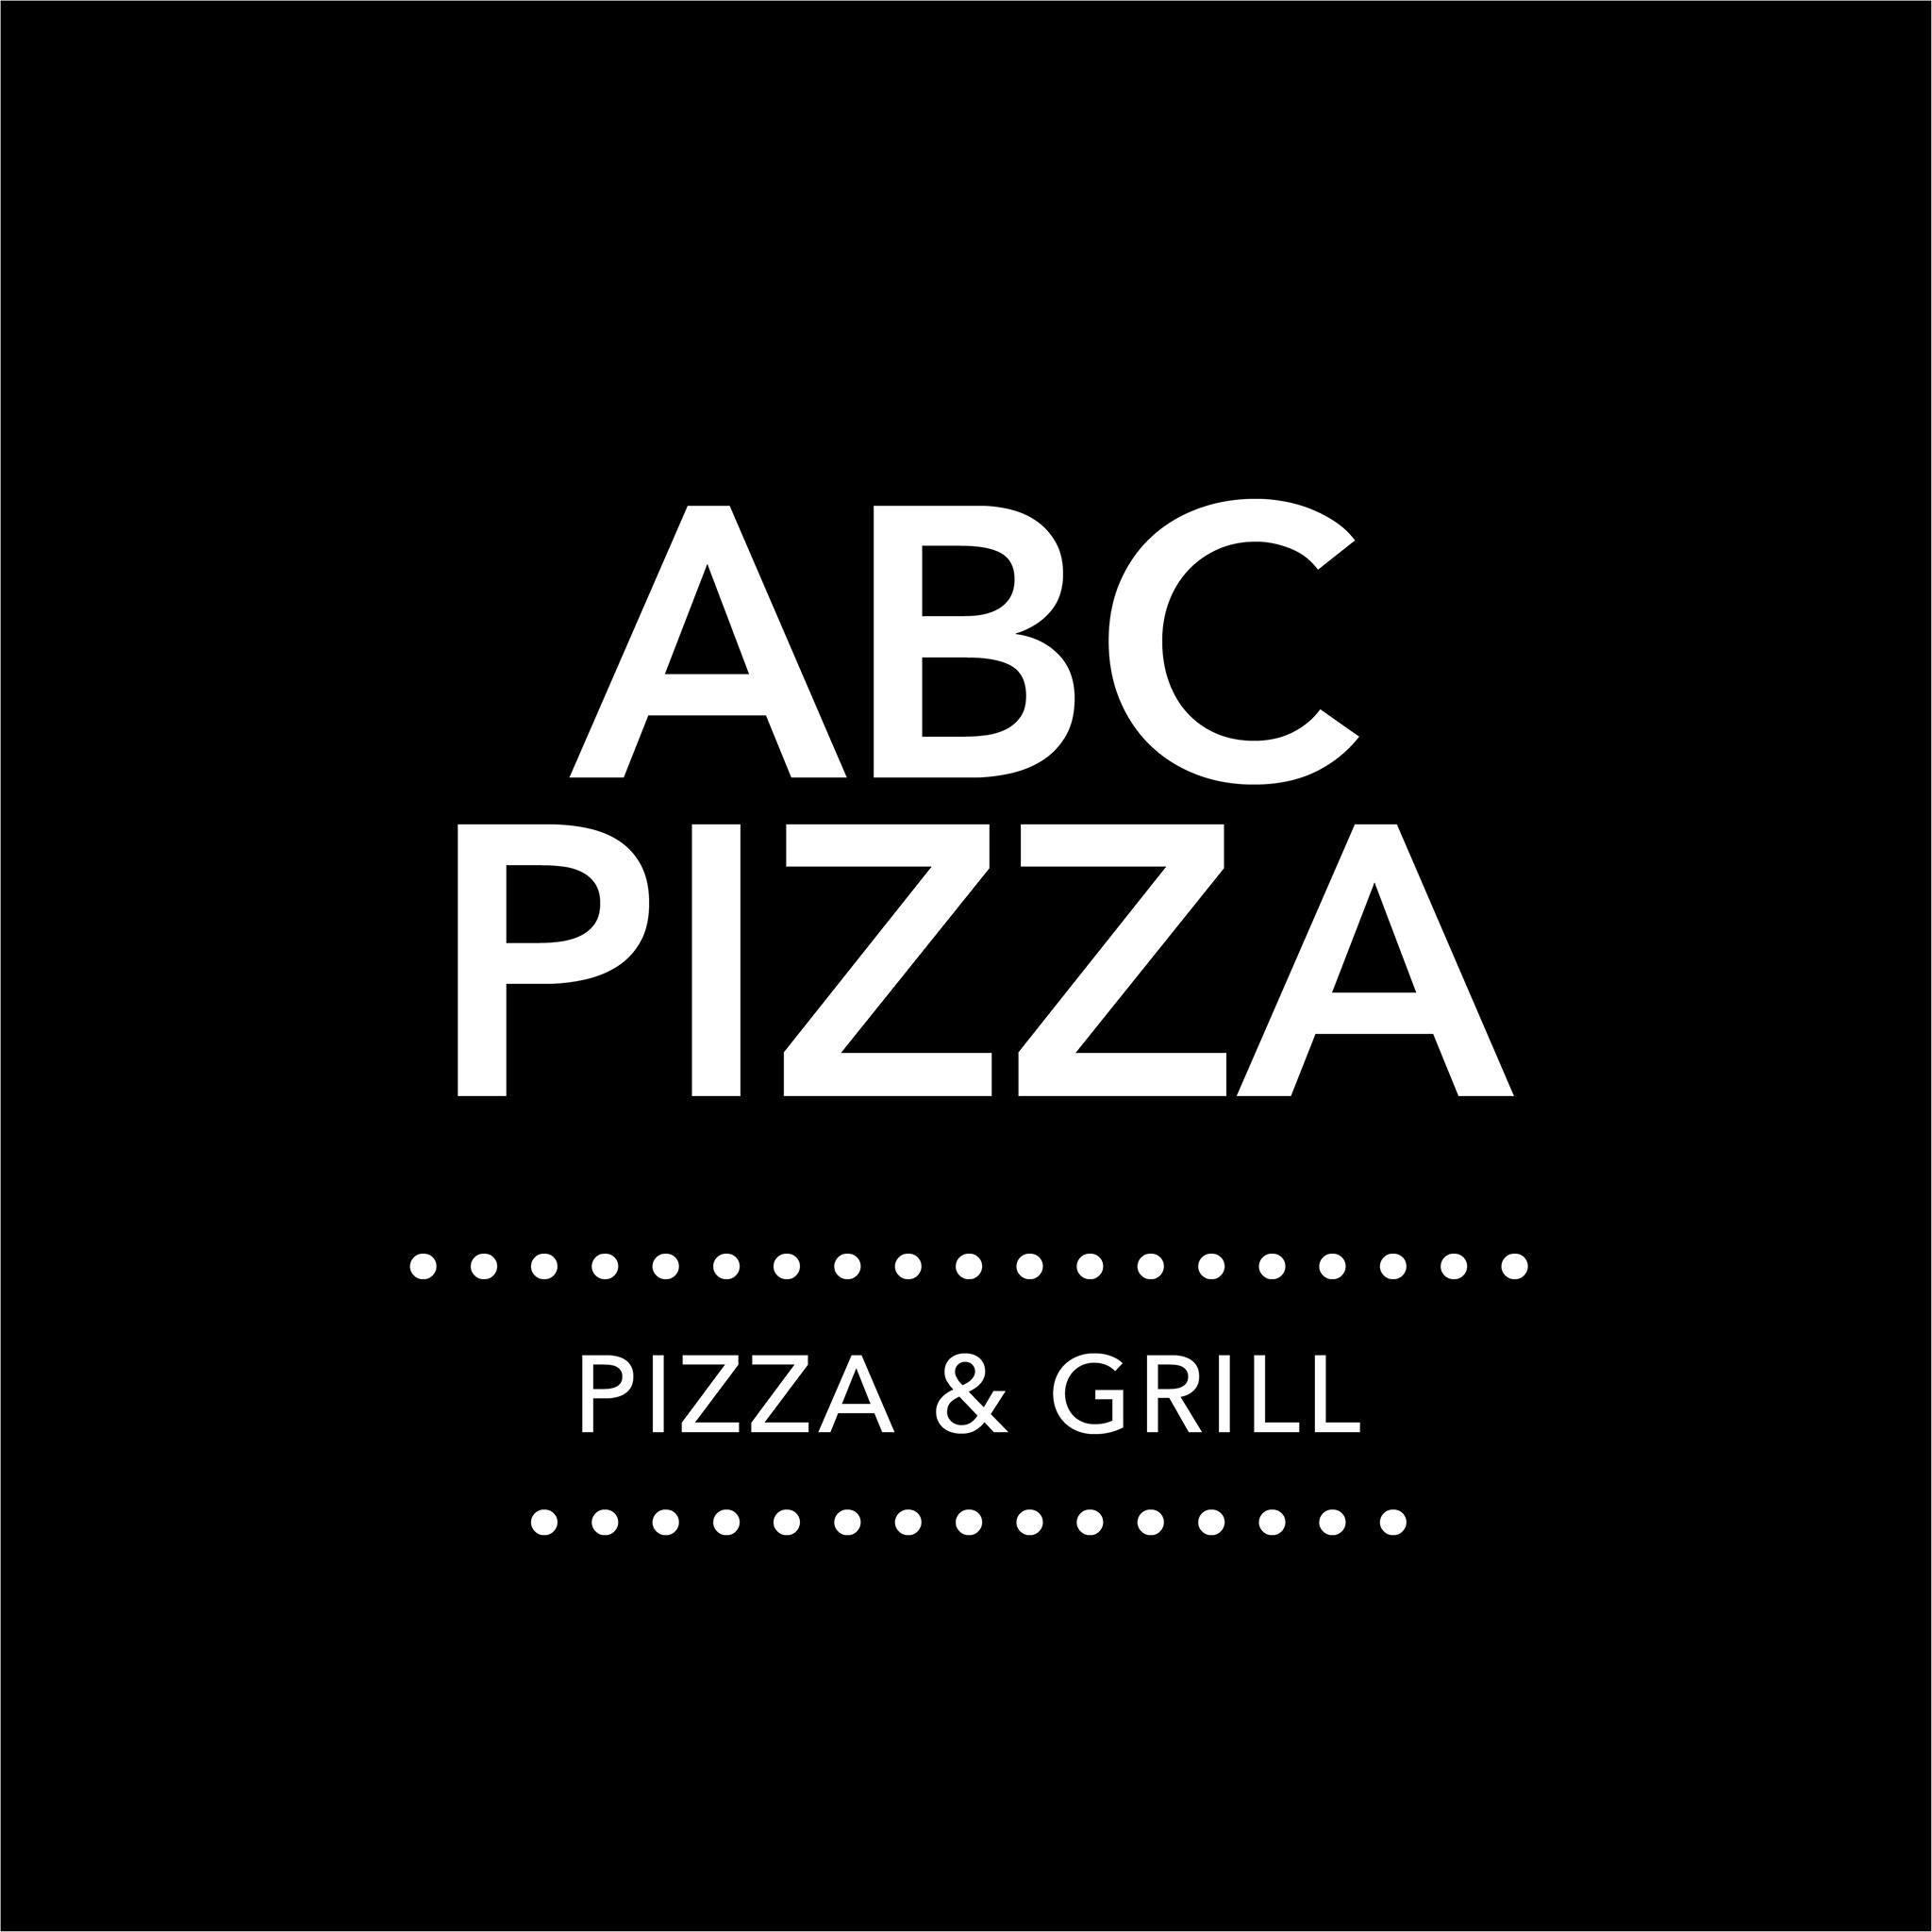 ABC Pizza logo